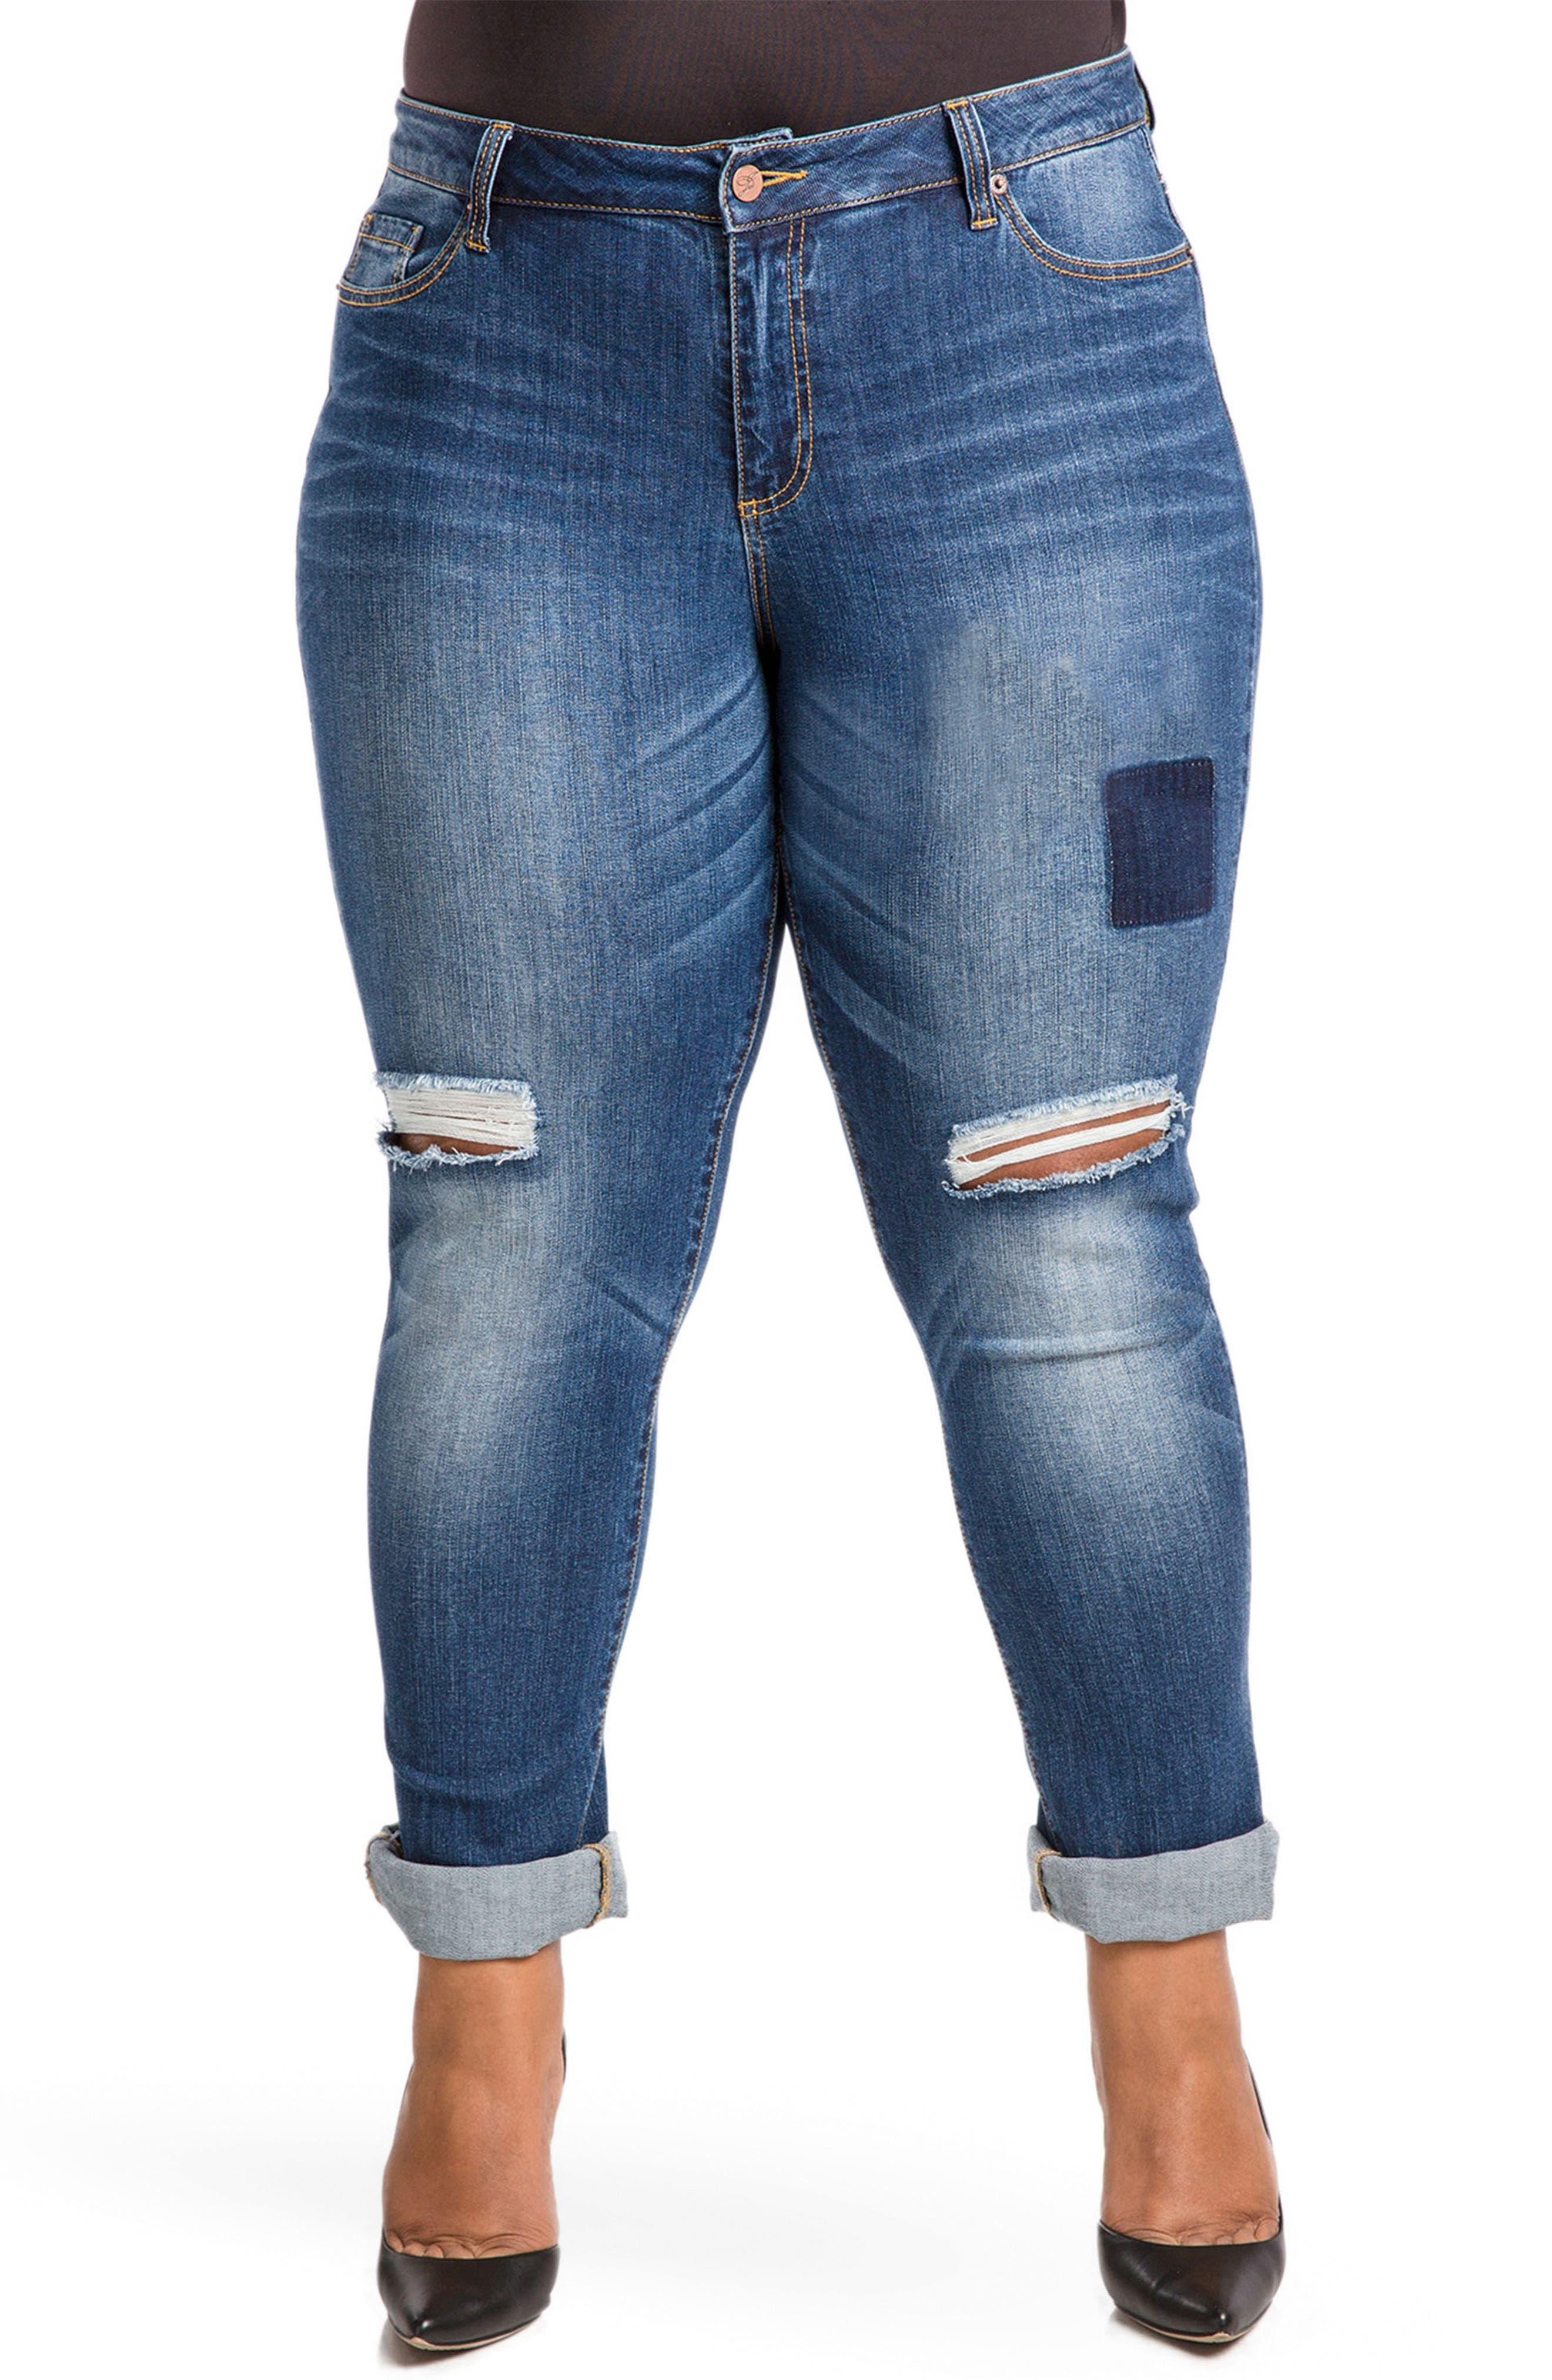 Poetic Justice Shaw Curvy Fit Boyfriend Jeans (Plus Size)